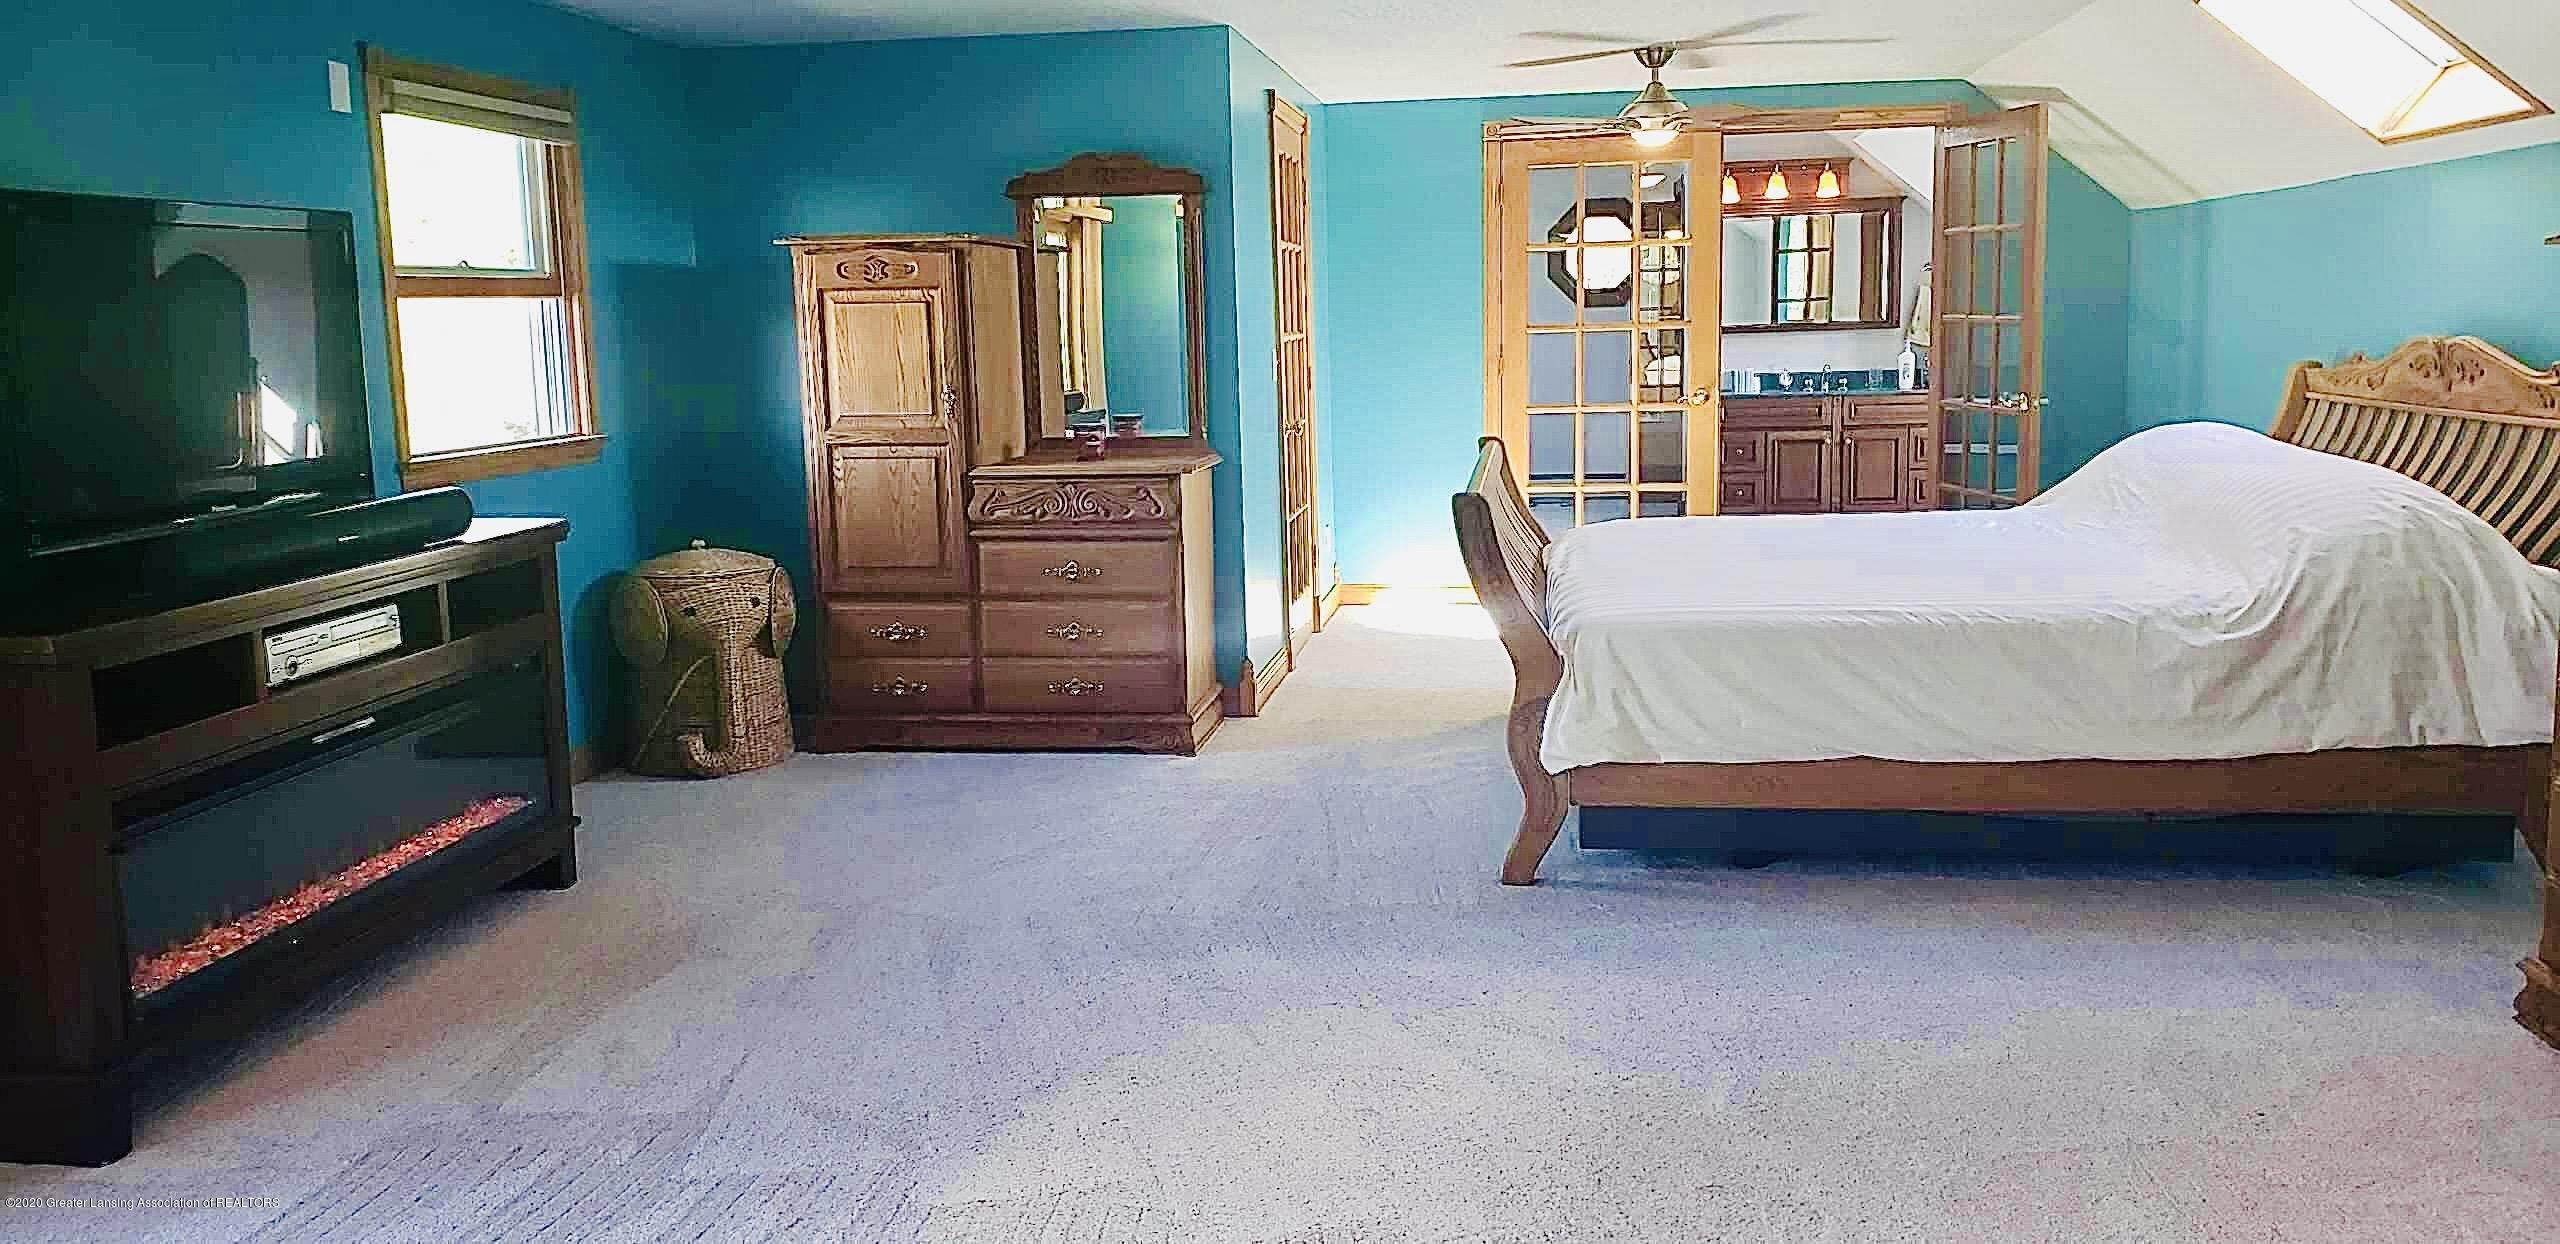 7346 W Cutler Rd - CUTLER BEDROOM - 41